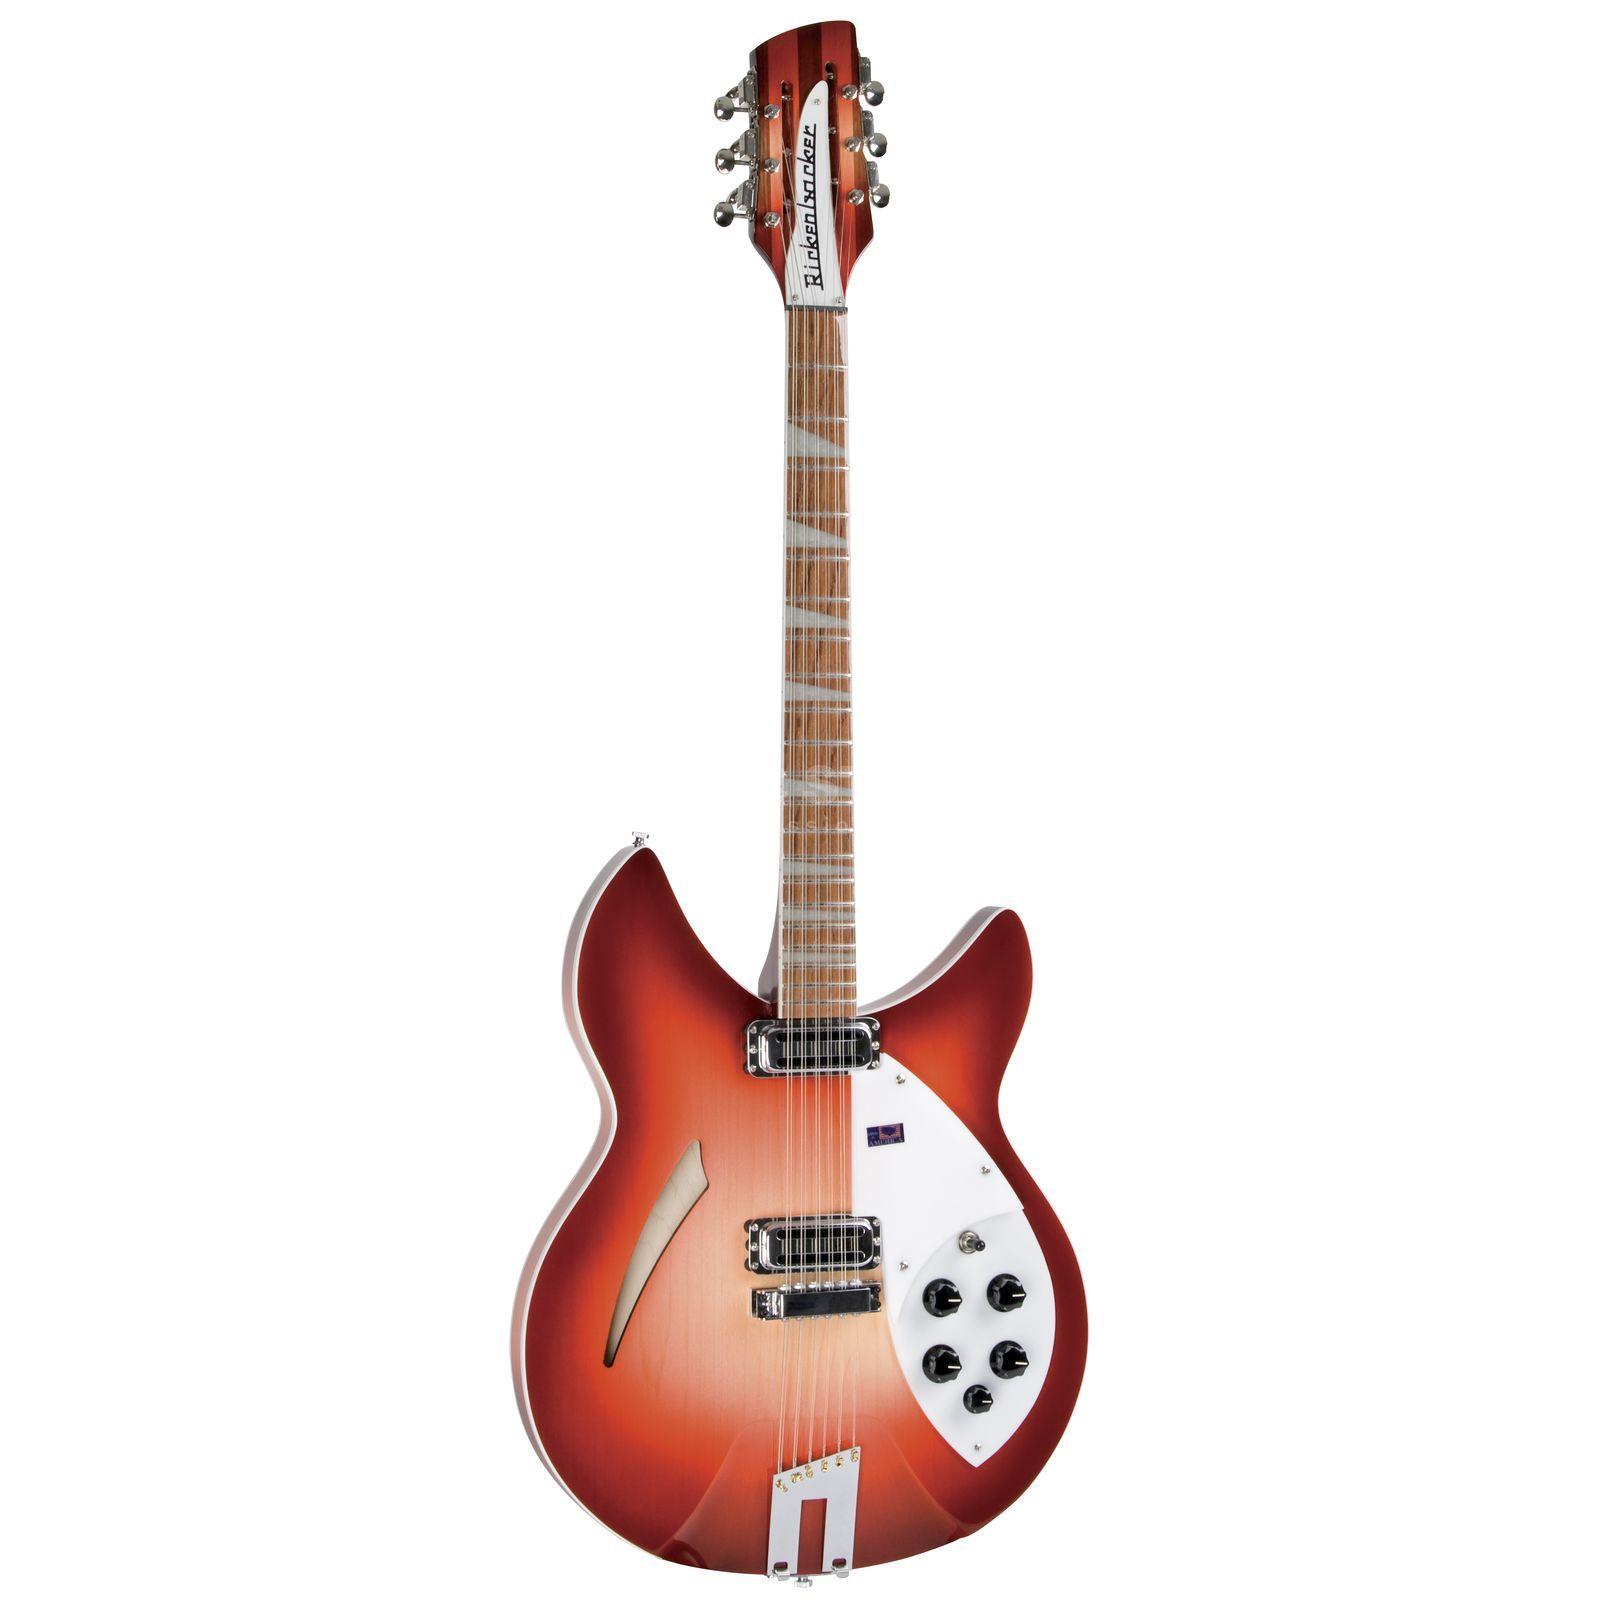 rickenbacker 360 12c63 12 string semi acous tic guitar fireglo. Black Bedroom Furniture Sets. Home Design Ideas